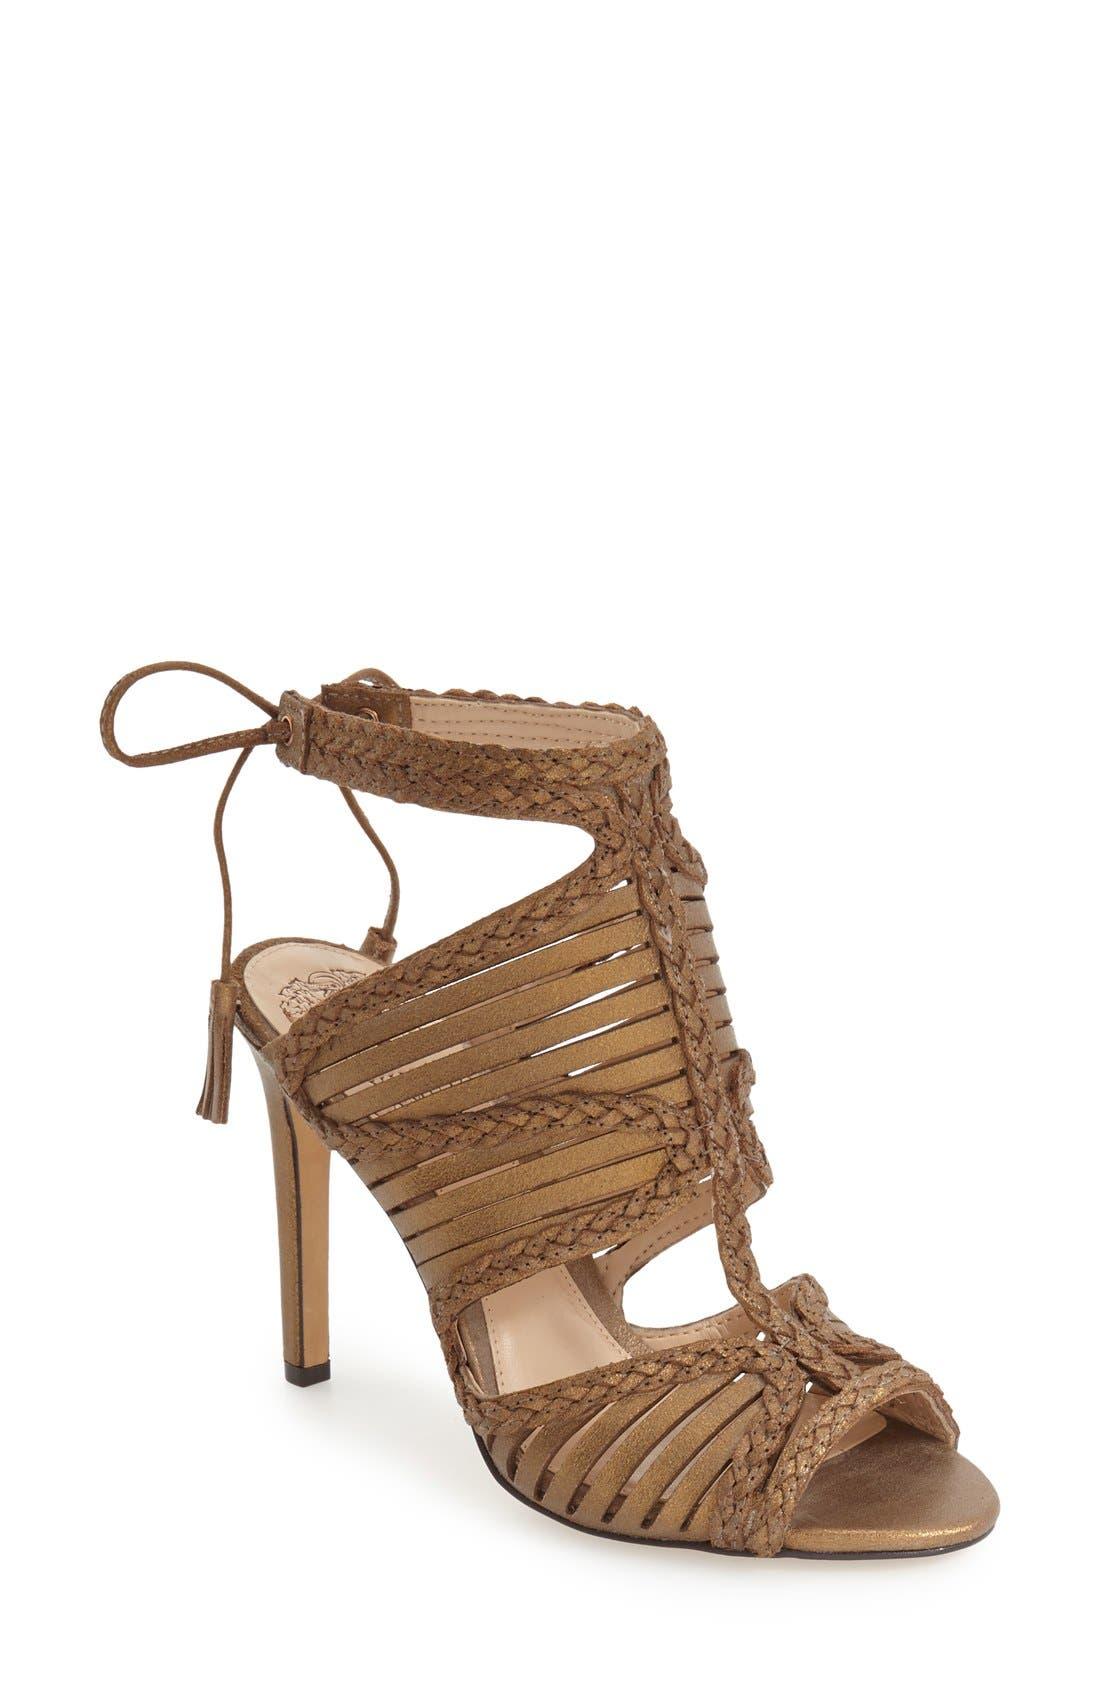 Main Image - Vince Camuto 'Kabira' Strappy Sandal (Women)